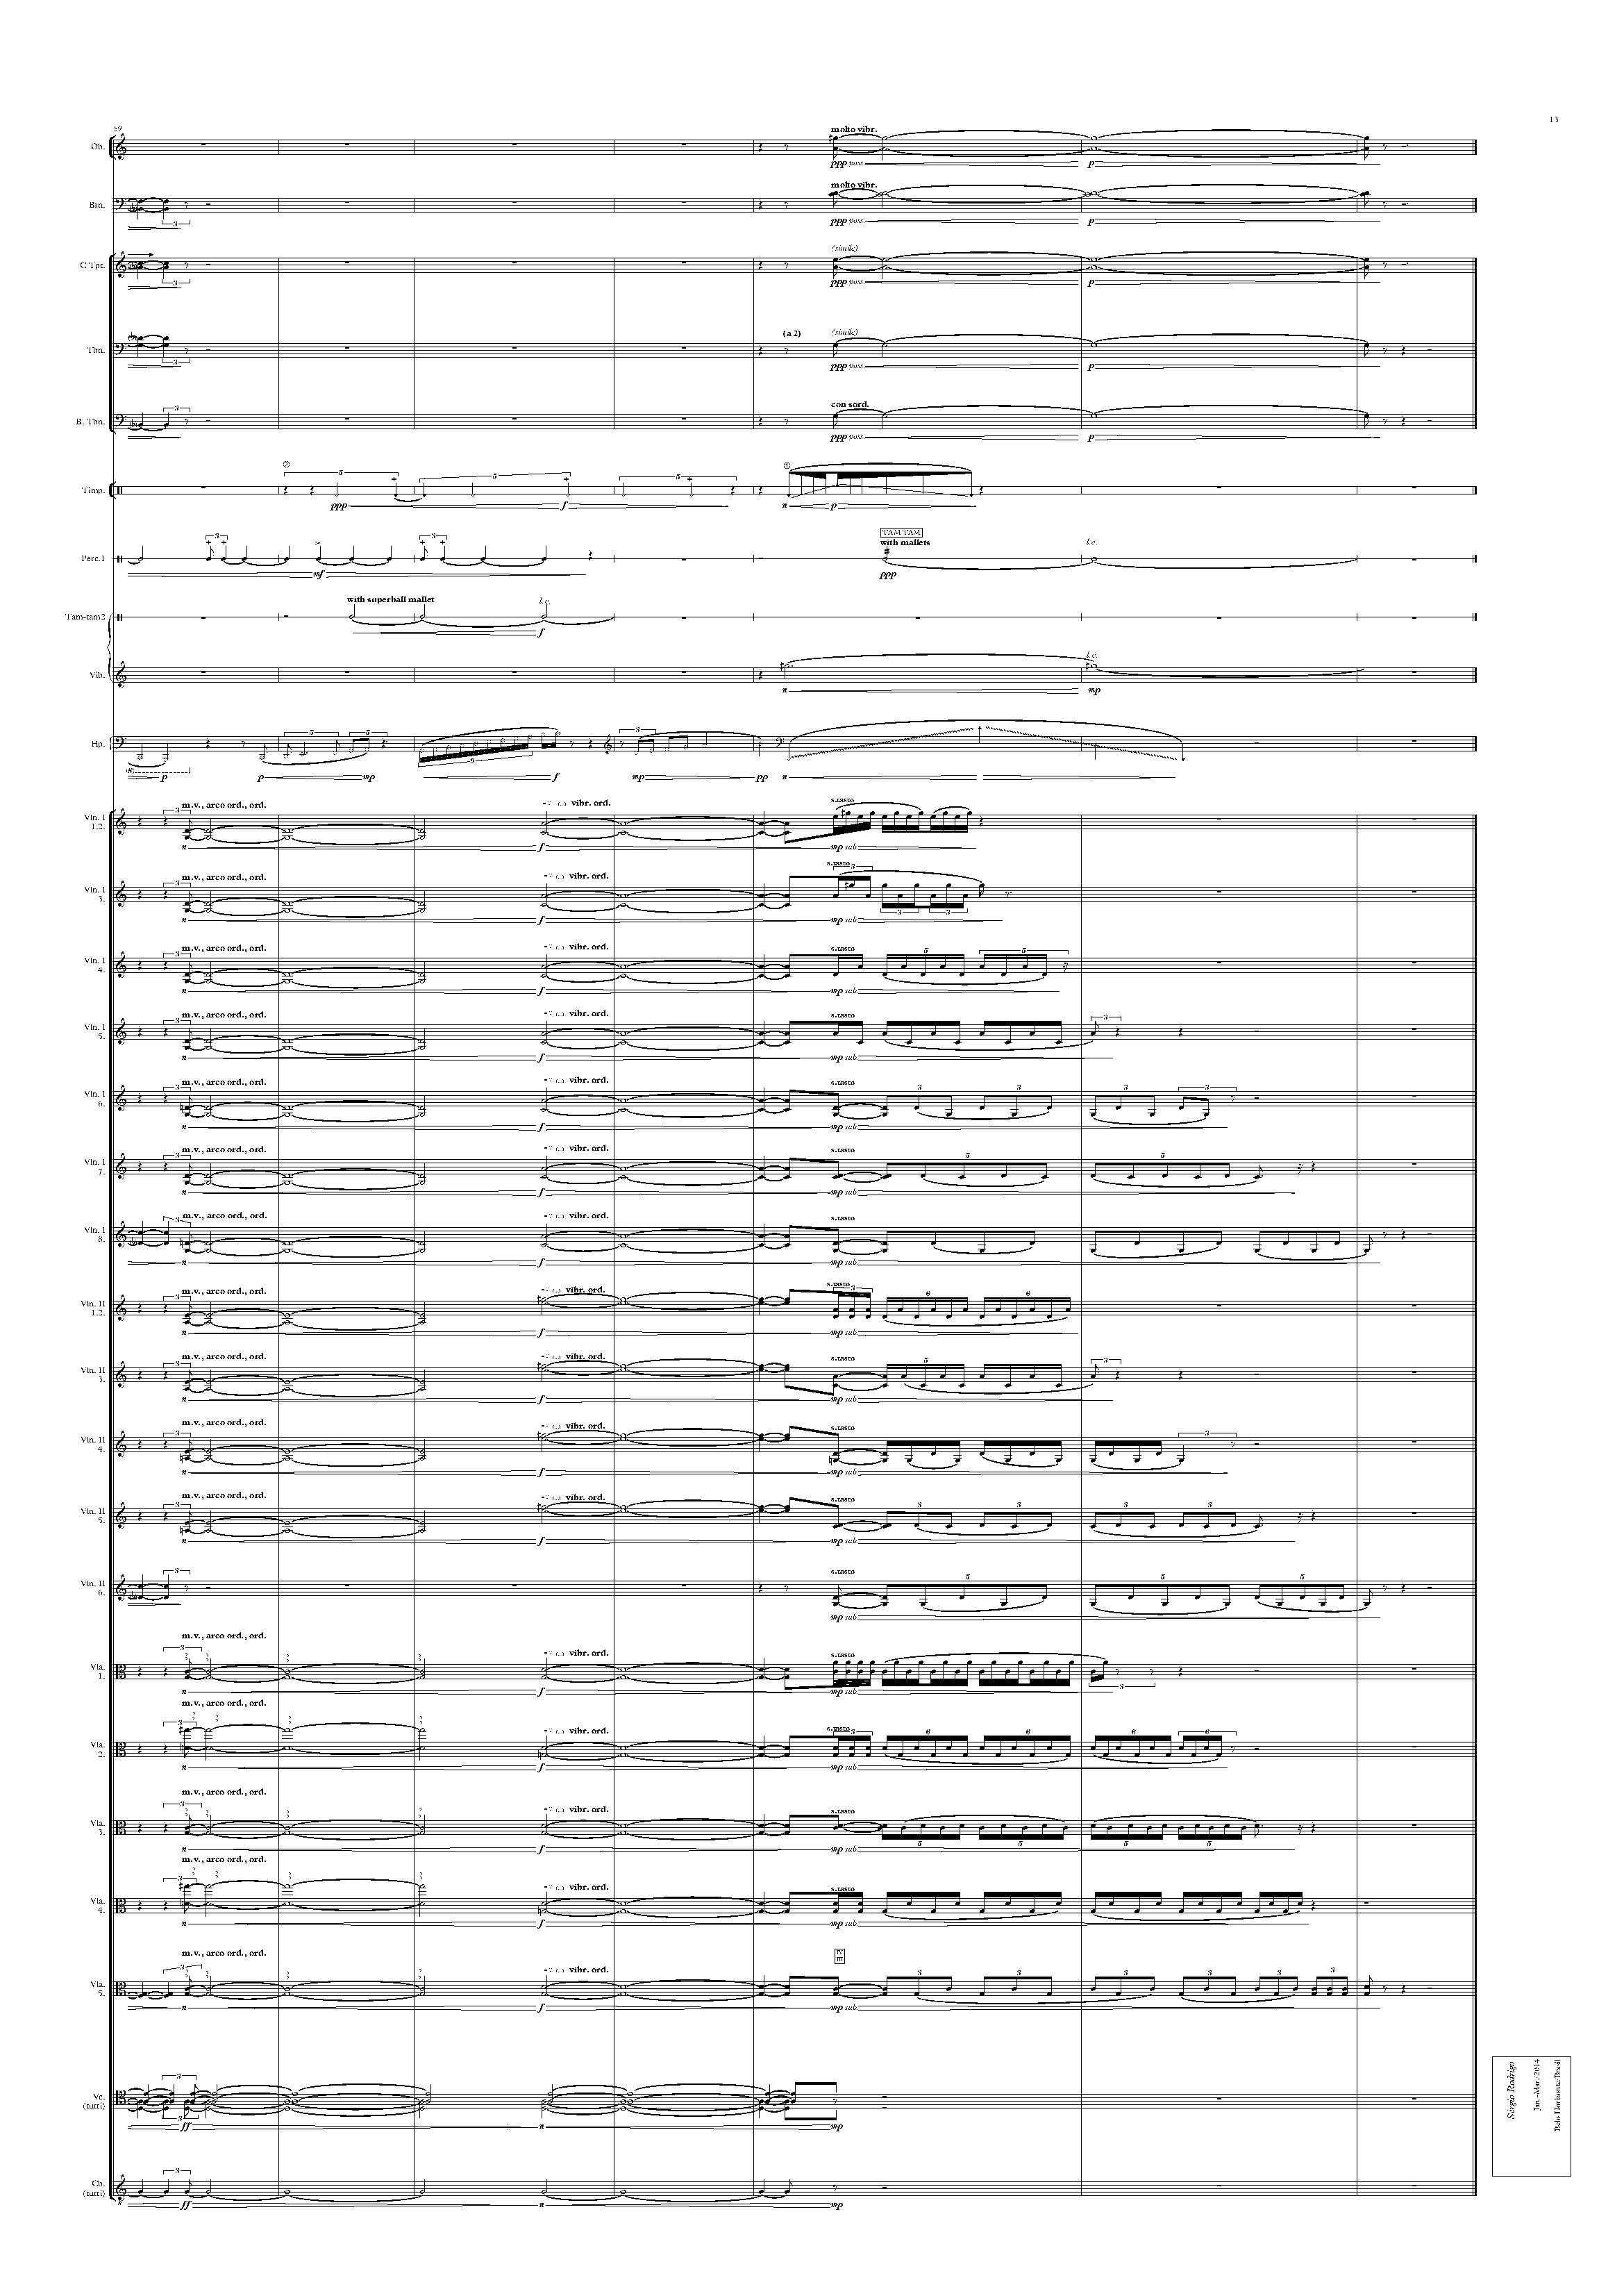 00 Plage des amours - Full Score_Seite_12.jpg